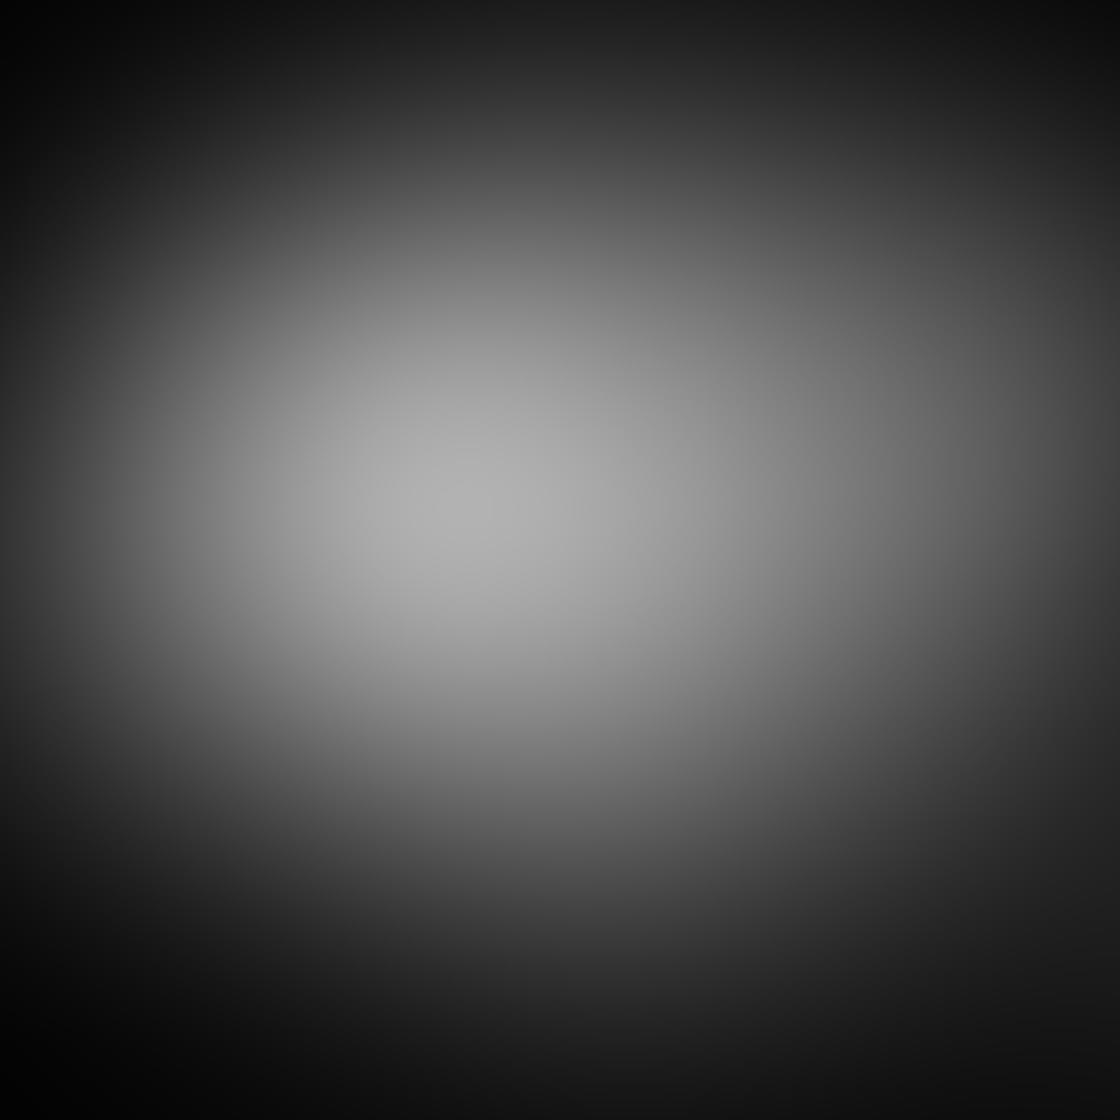 iPhone Photo Shadows 14